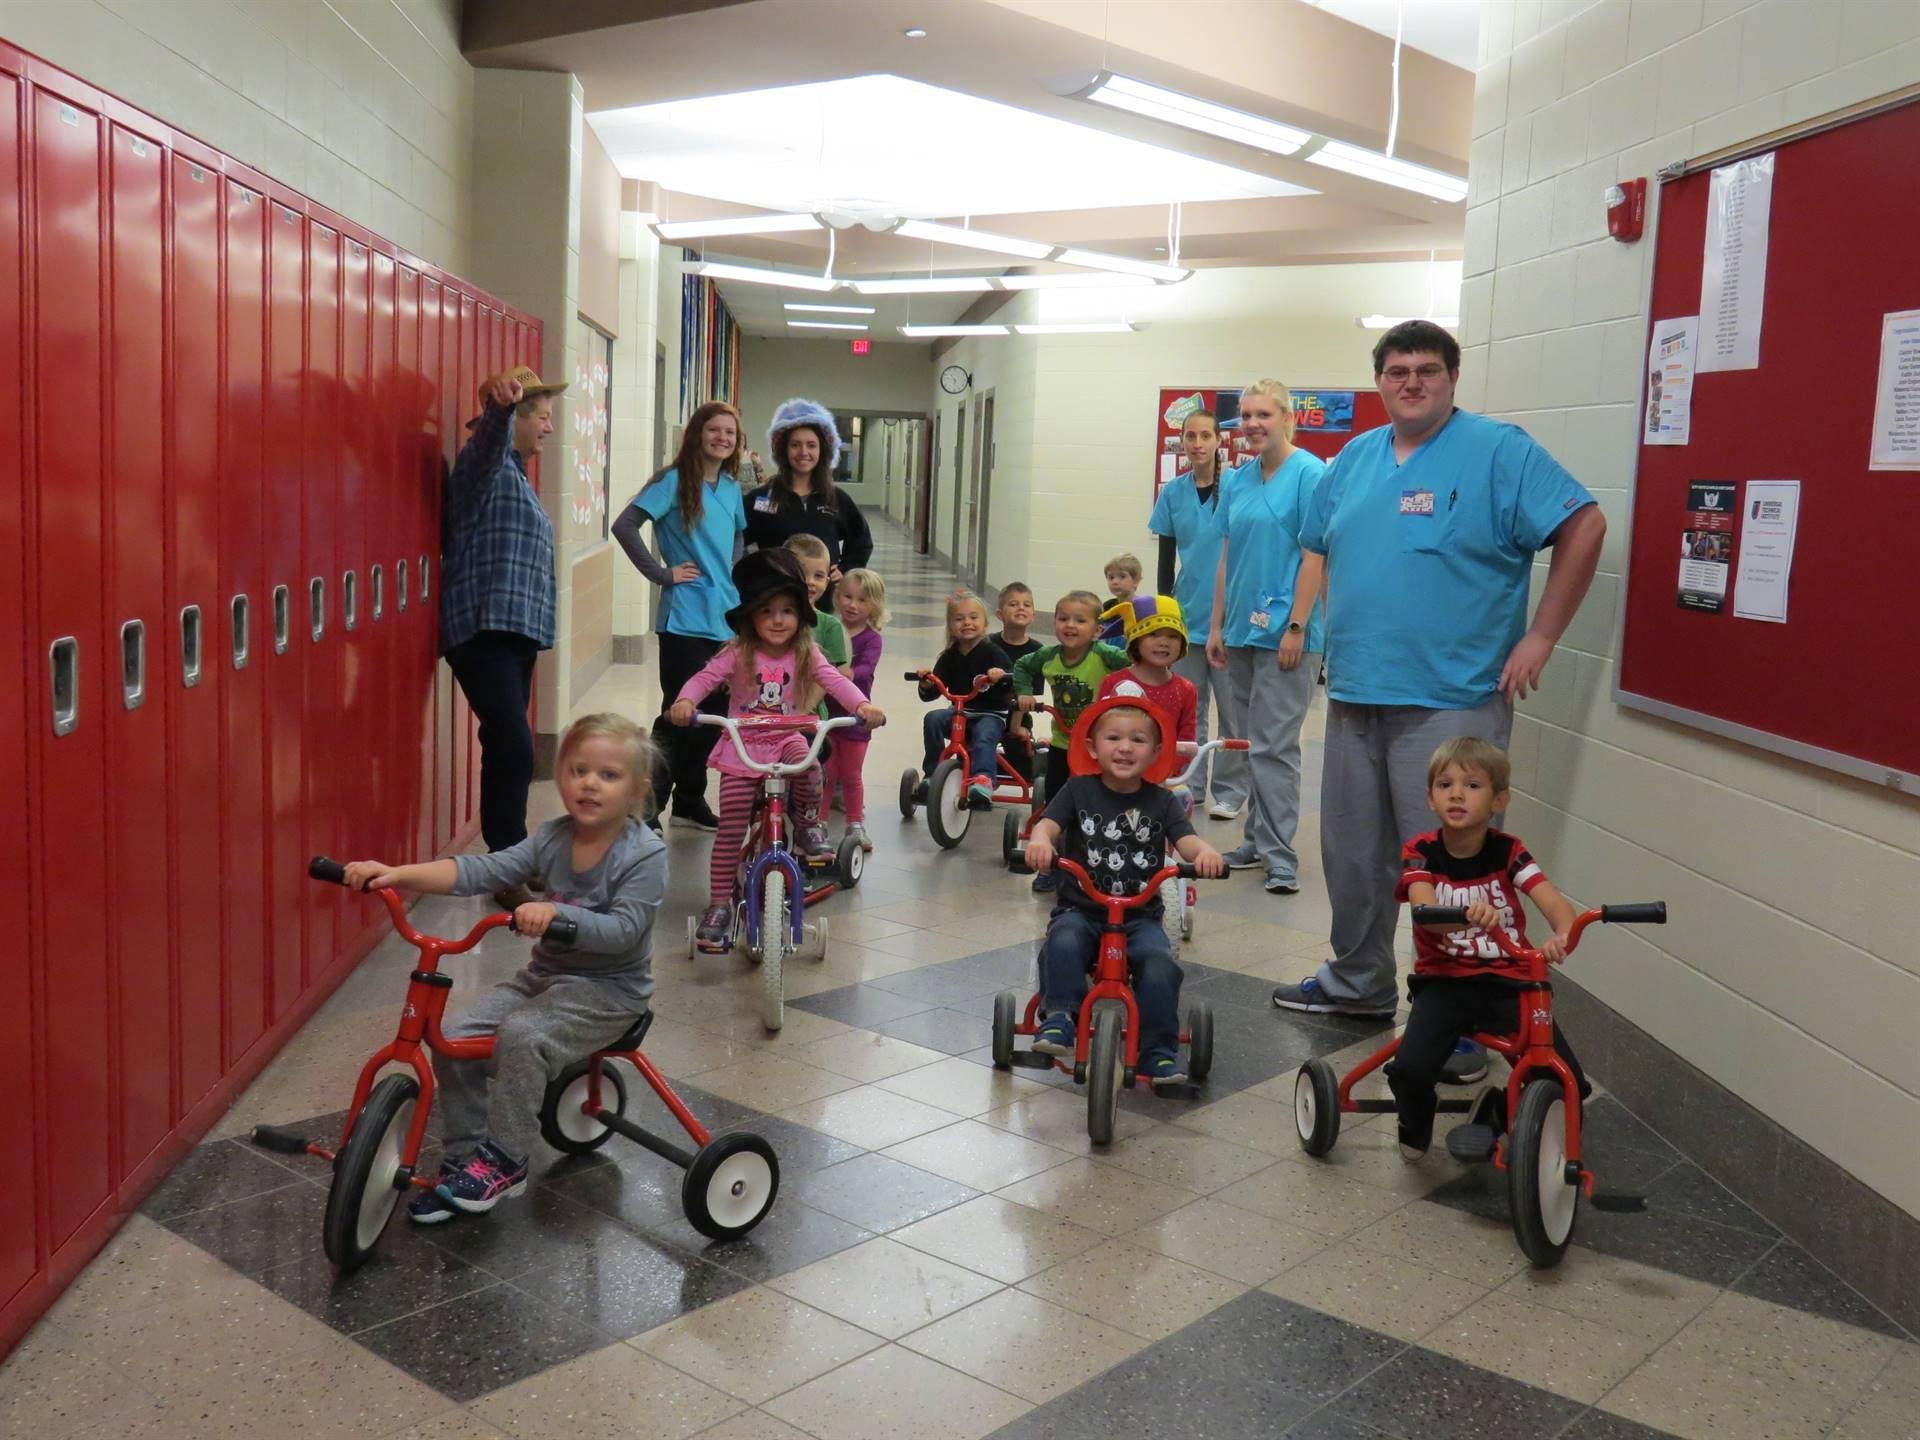 Preschoolers wearing hats on trikes in the school hallway with students